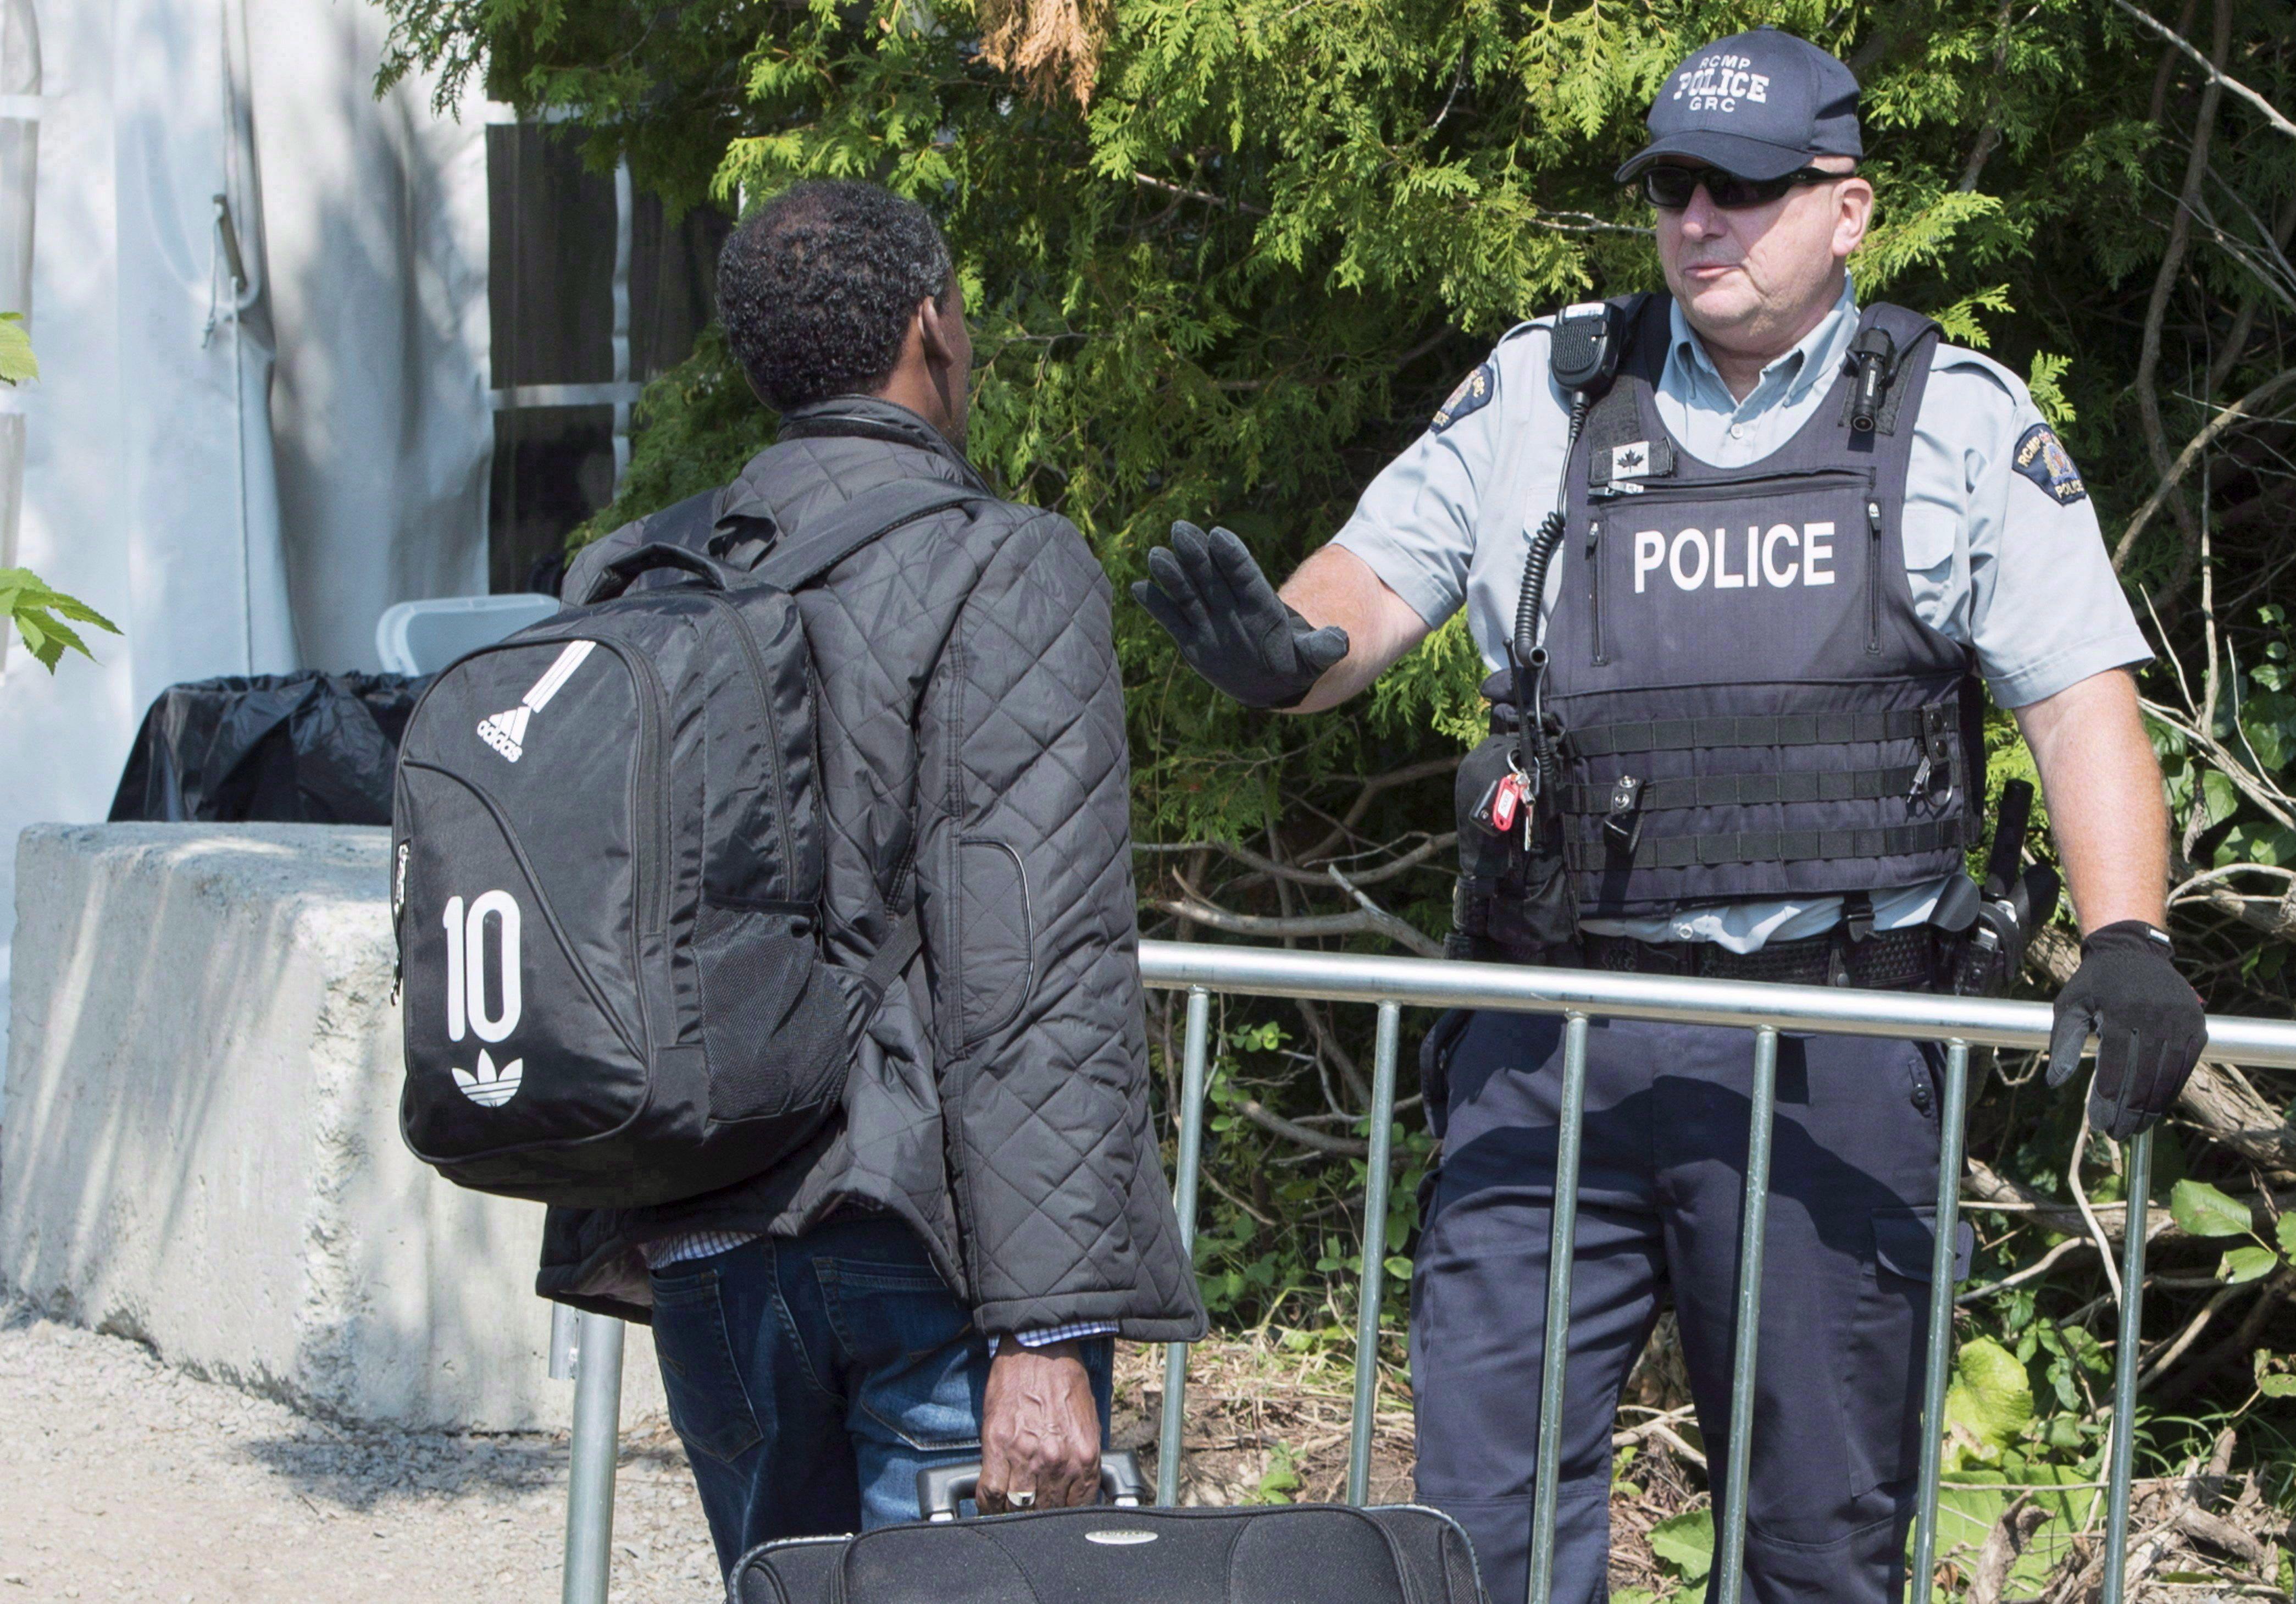 Fewer Than 850 Irregular Border-Crossers Deported, Hundreds More in Limbo